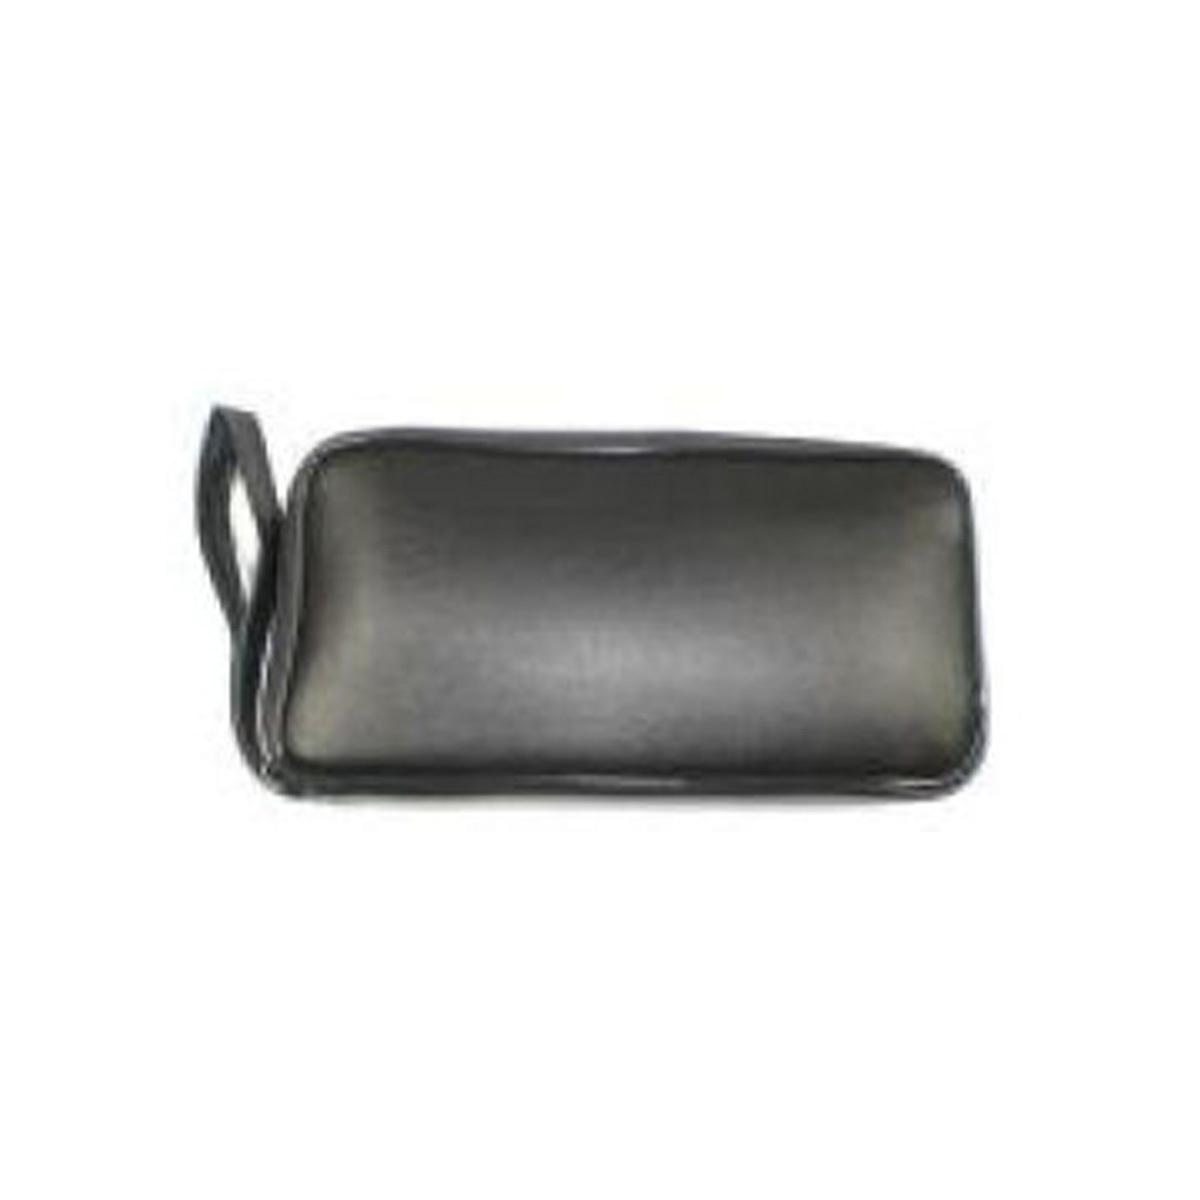 30-5501-holzfeuchtemessgerät-humidcheck-pro-zubehör-1200x1200px.jpg